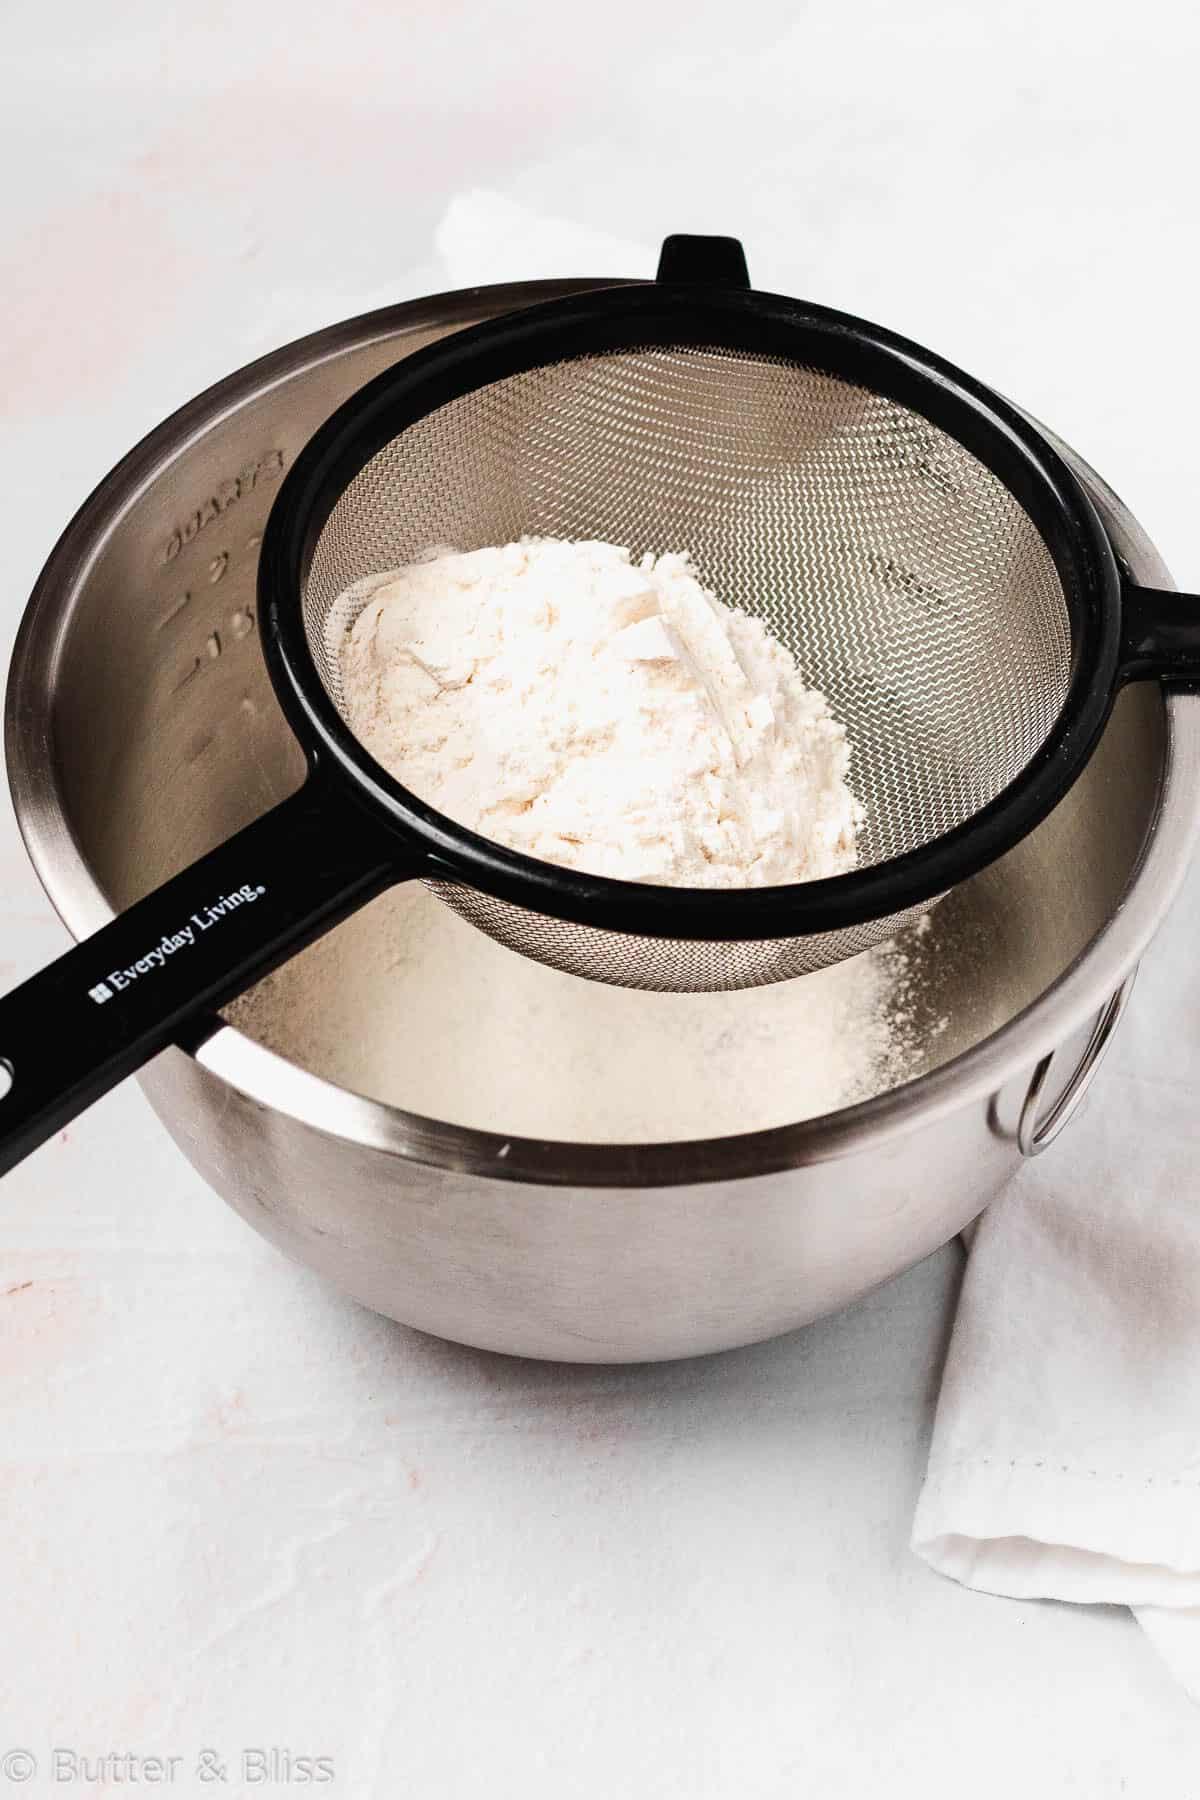 Sifting flour through a fine mesh strainer set over a bowl